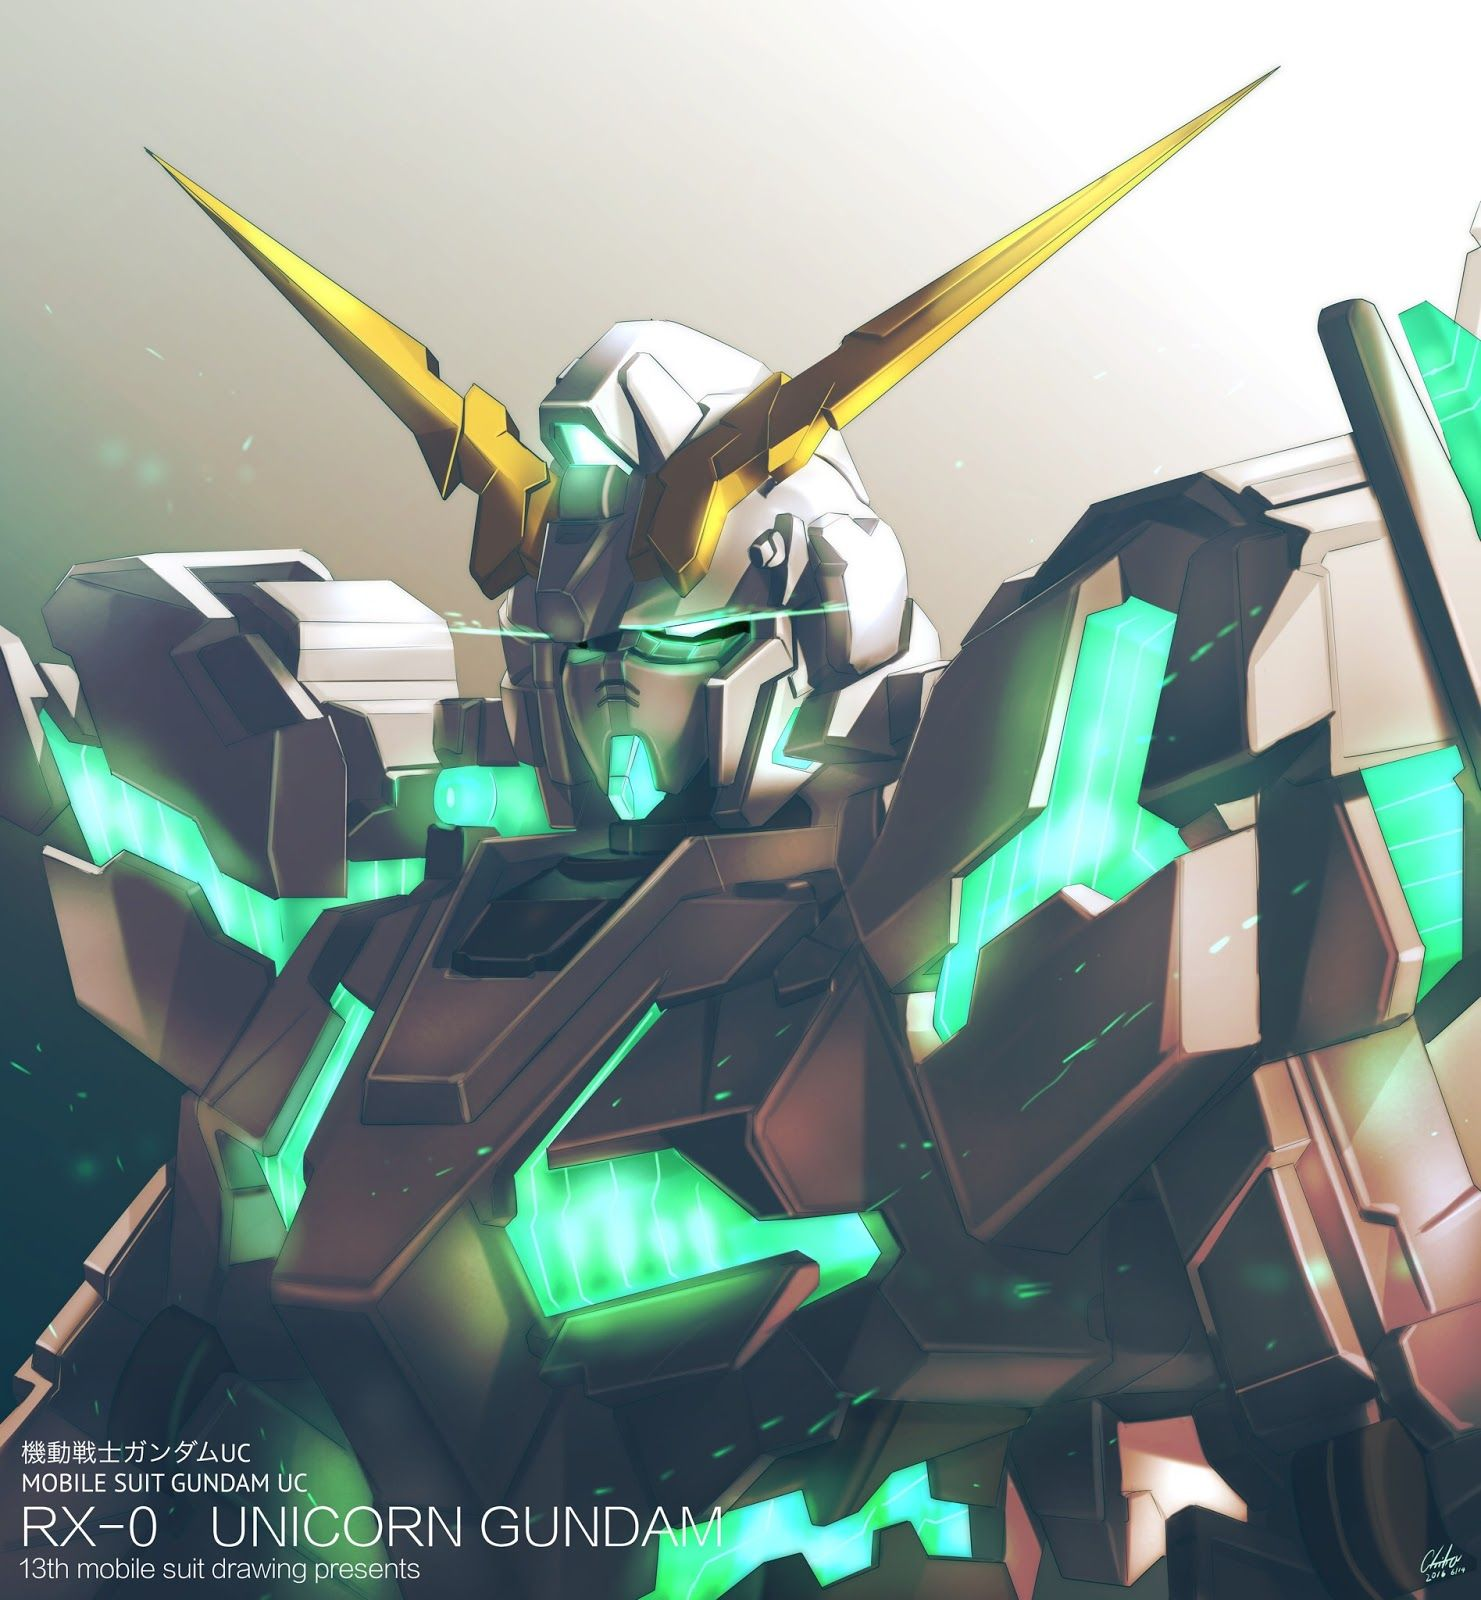 Gundam Iphone Wallpaper: GUNDAM GUY: Awesome Gundam Digital Artworks [Updated 6/22